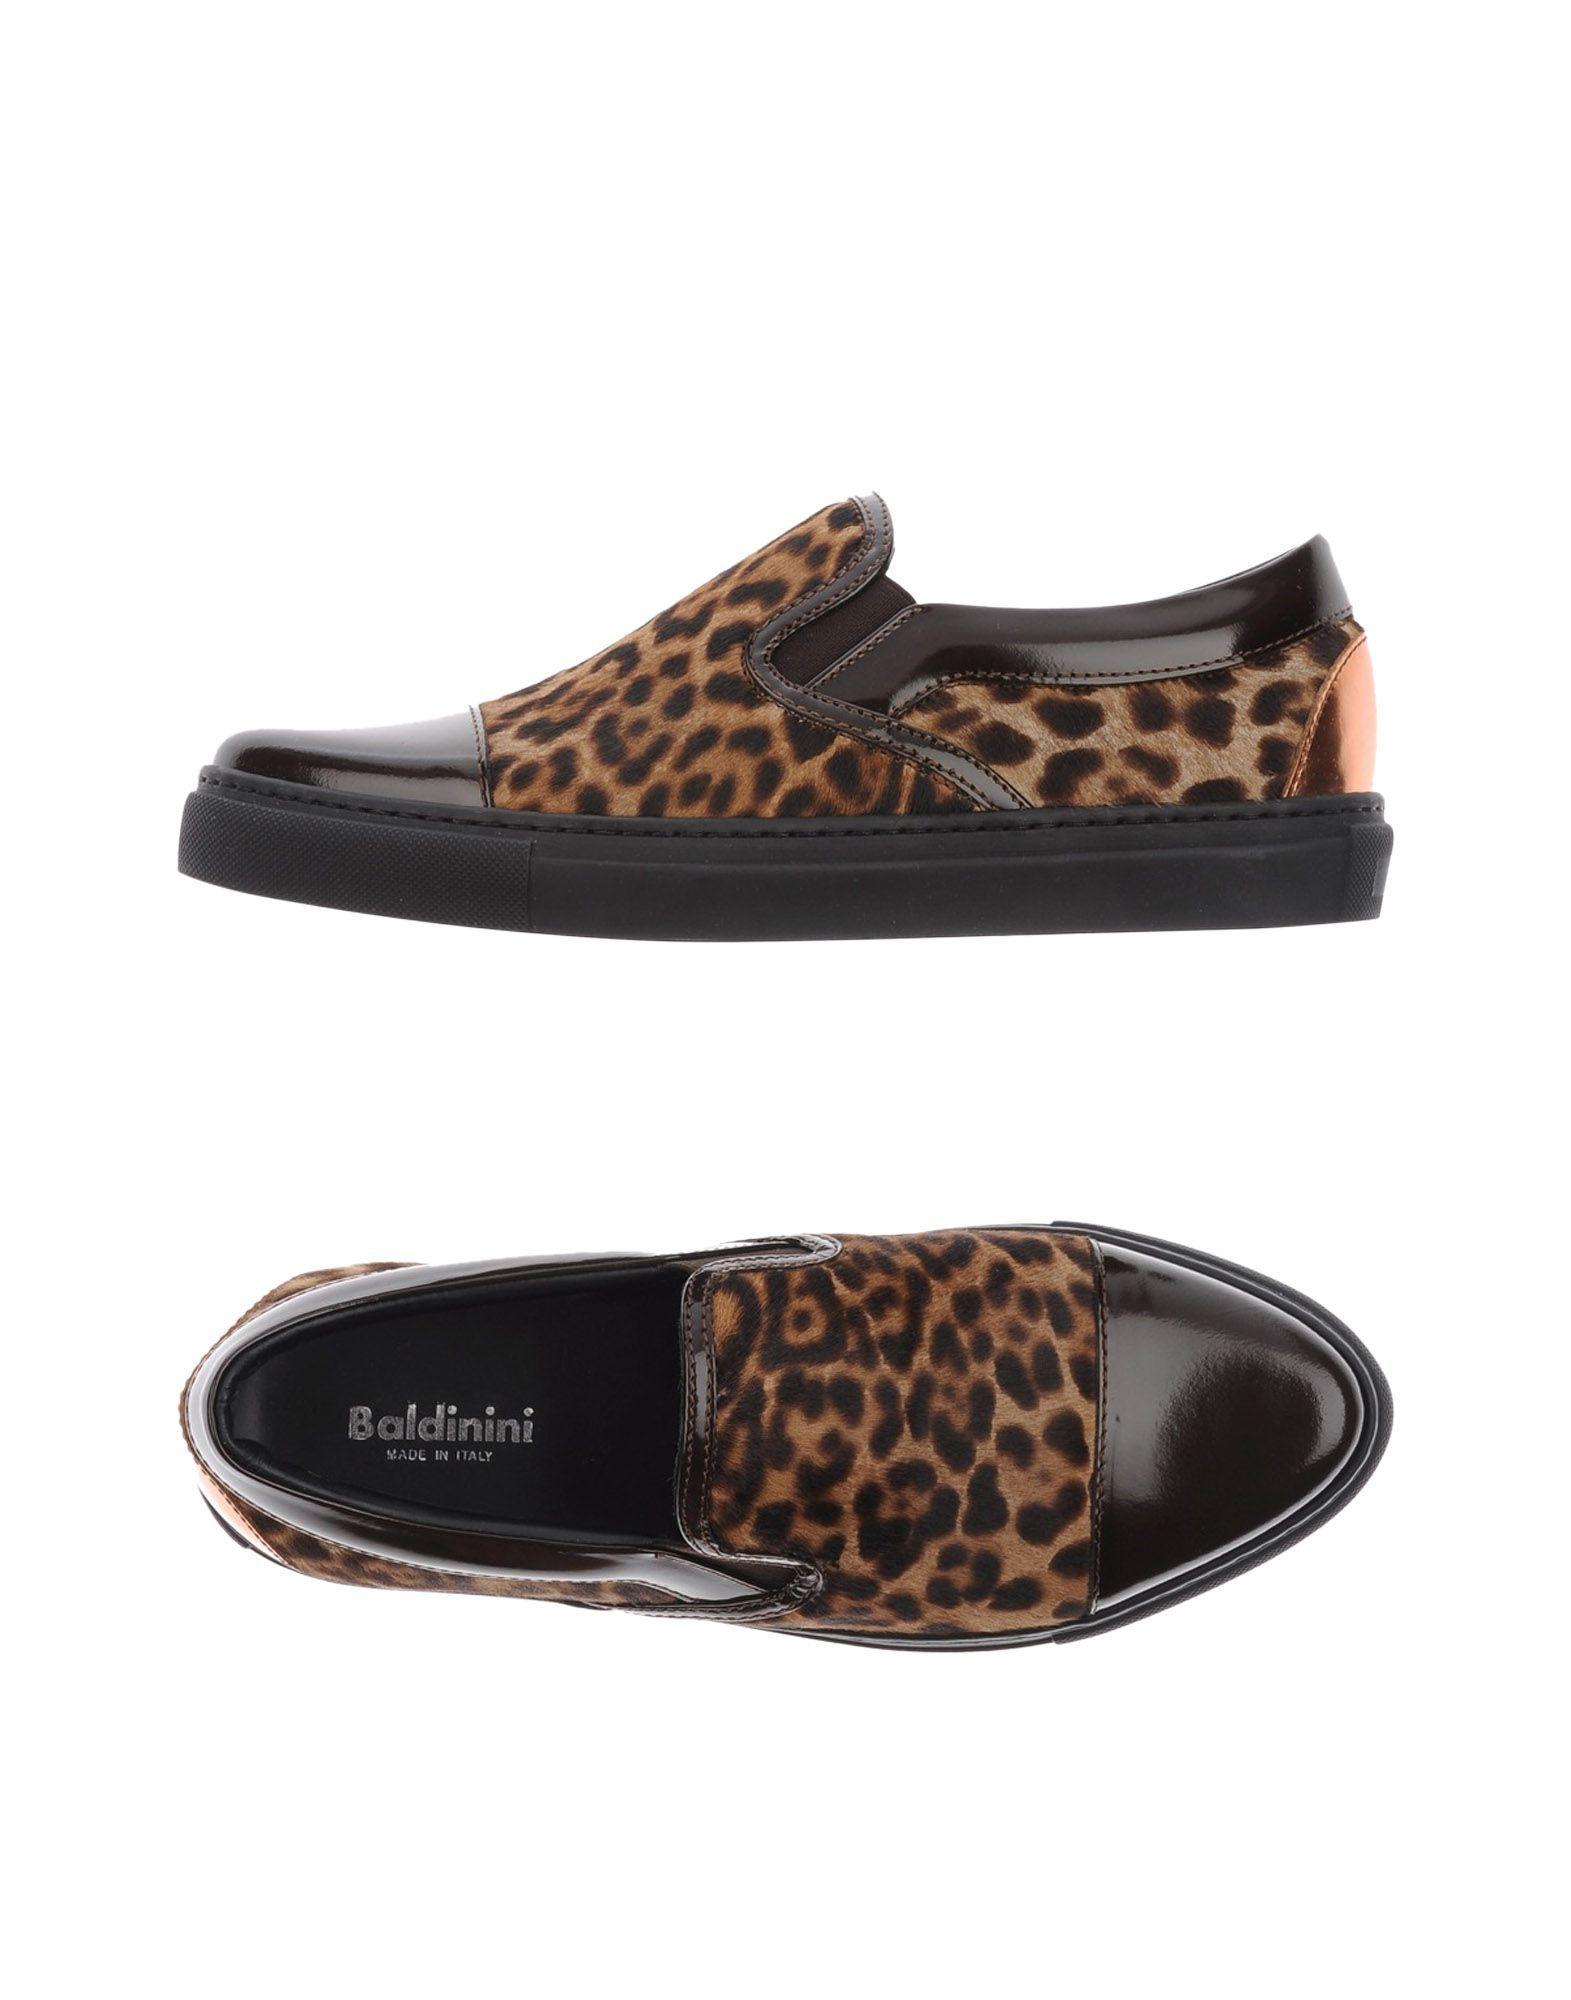 Baldinini Dark Brown Leopard Print Leather Loafers